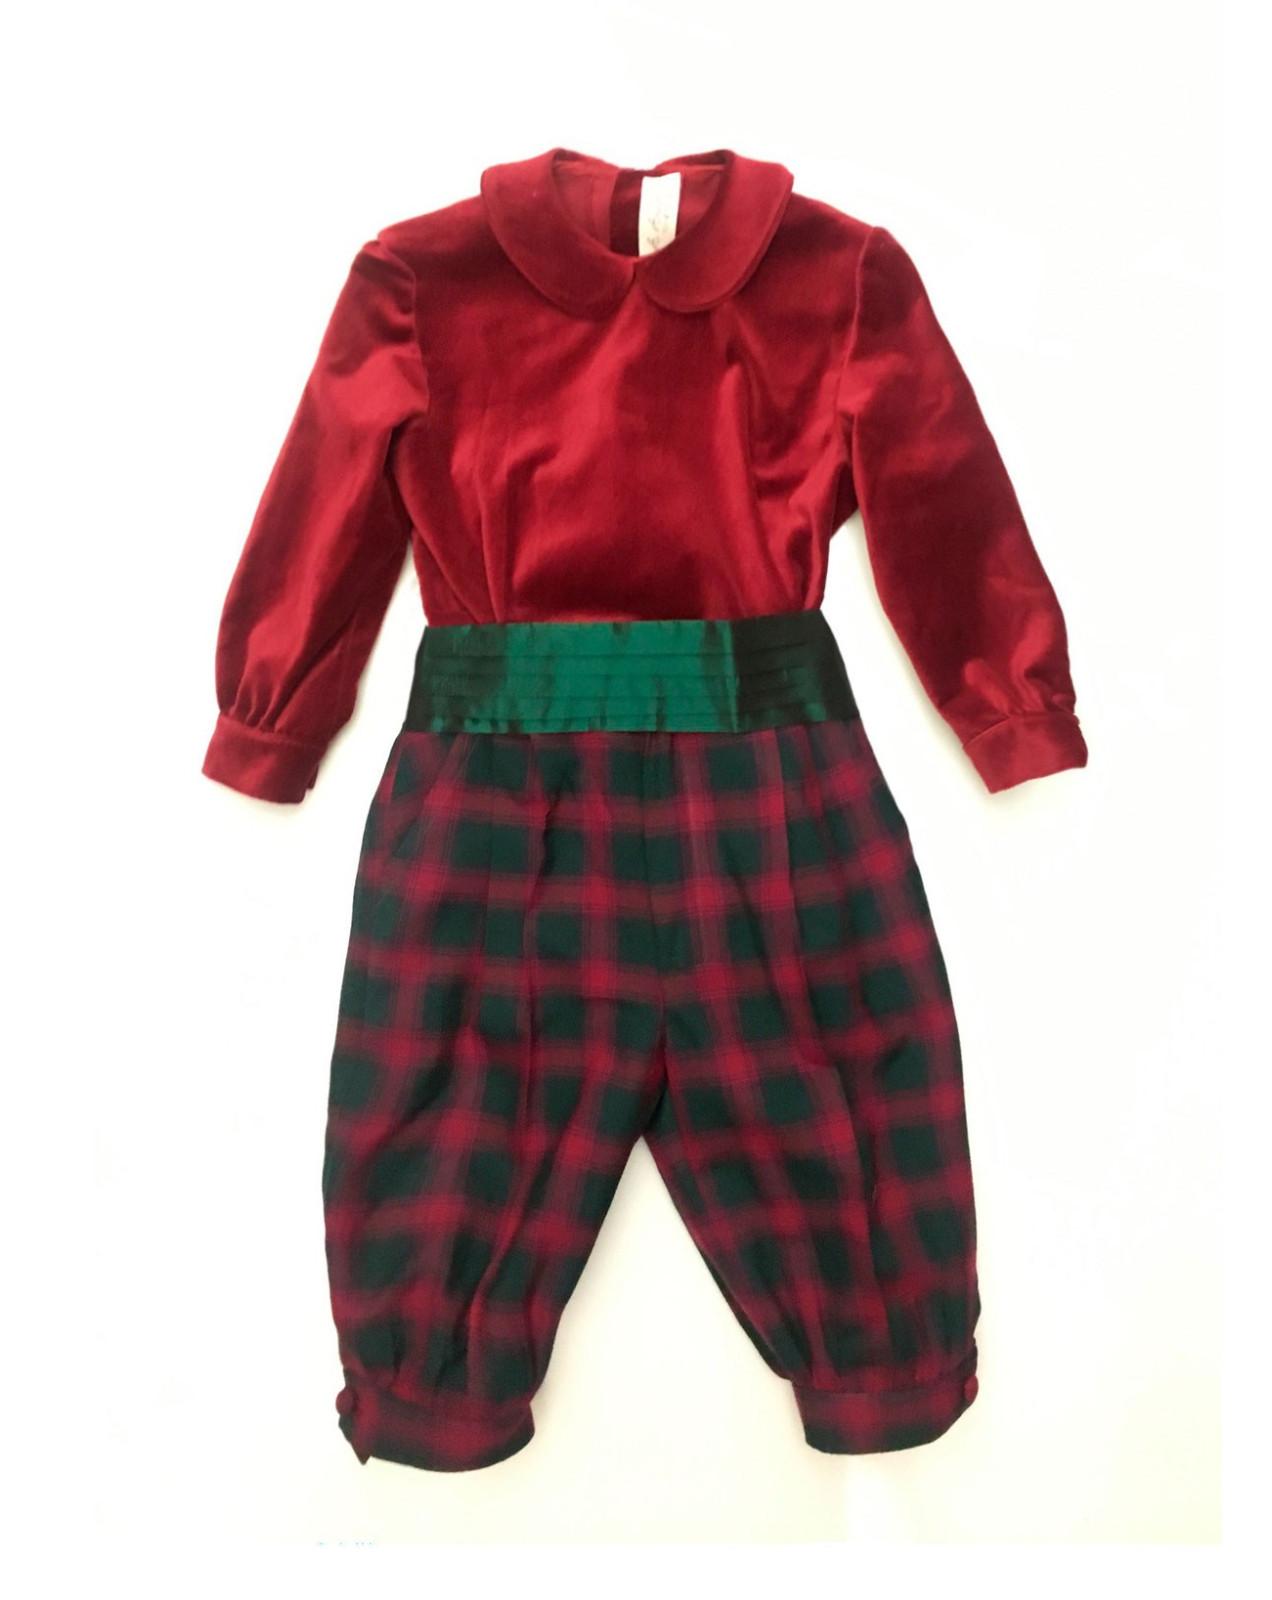 Lapo party boy outfit